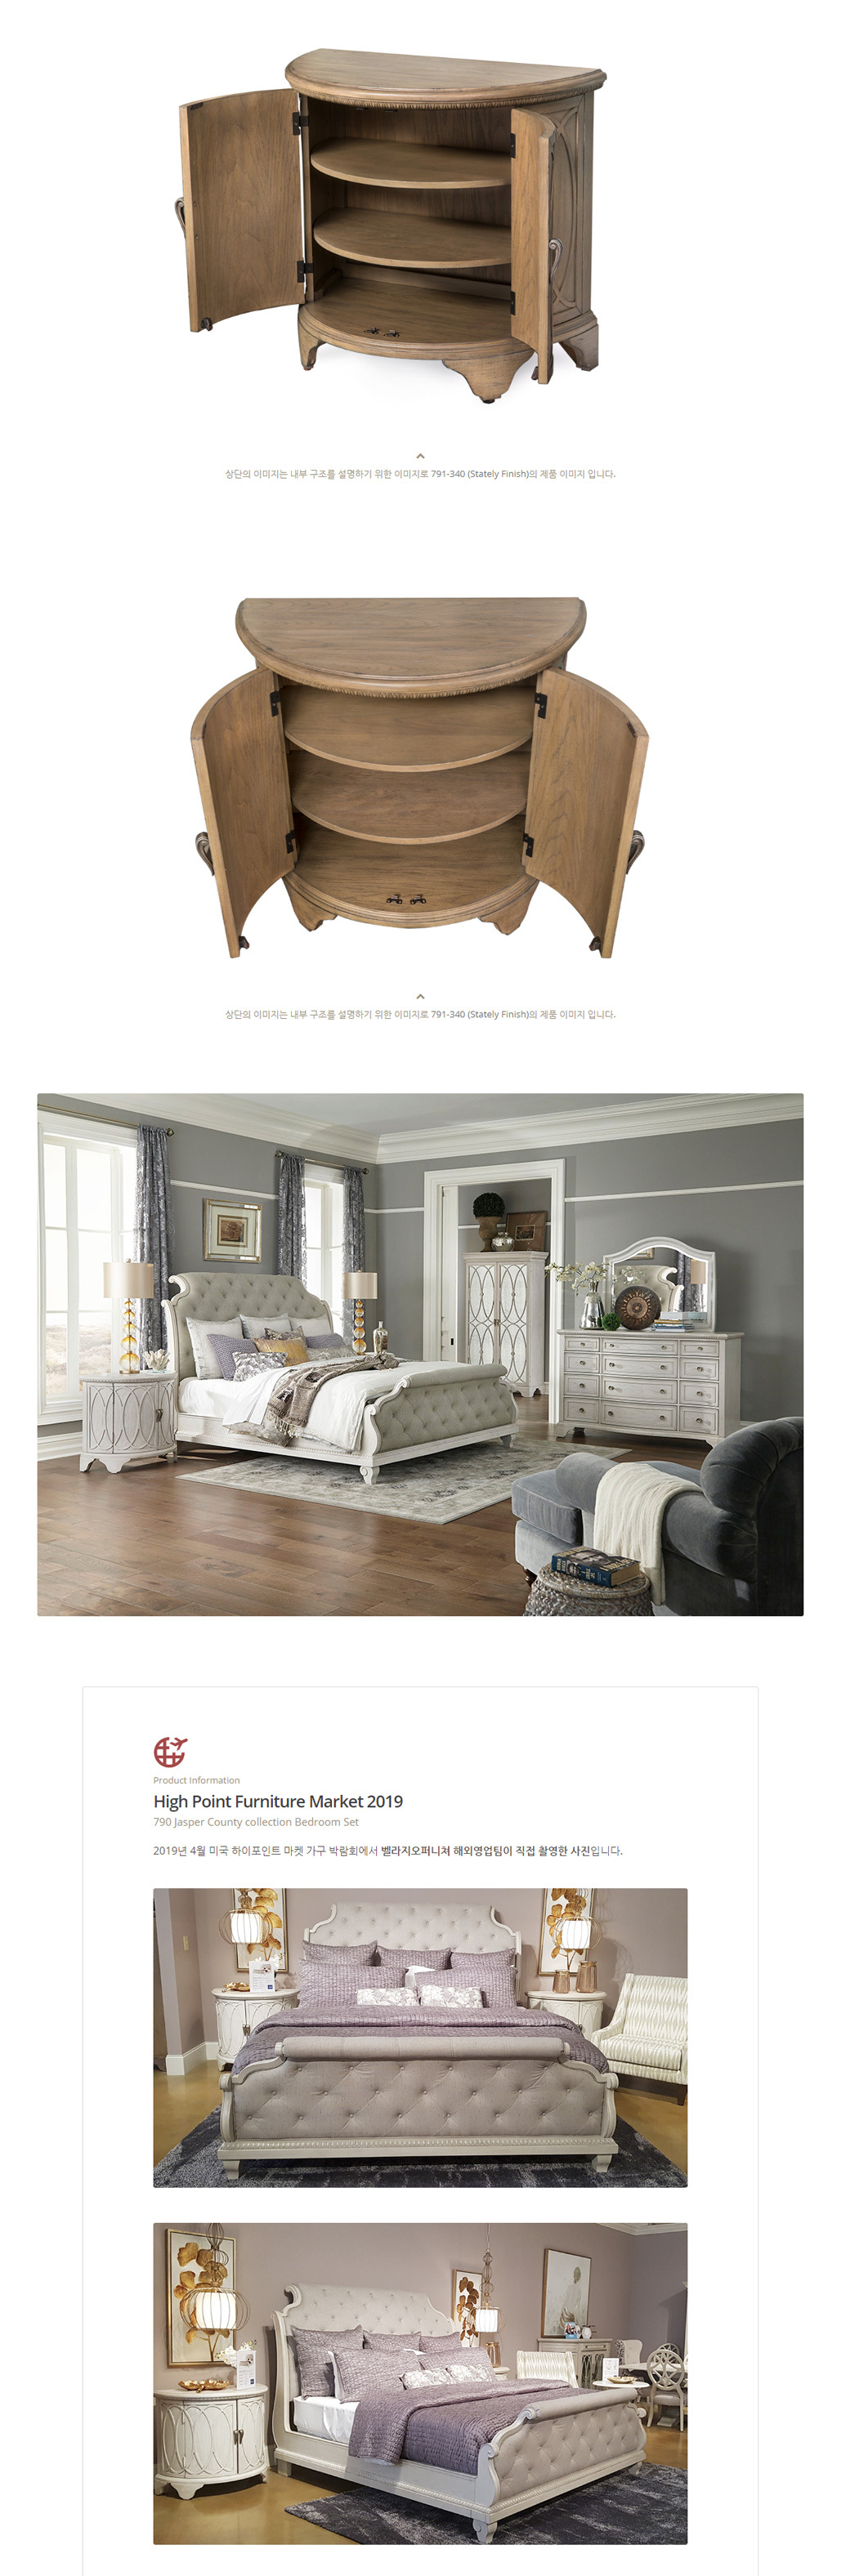 790_Jasper_County_Bedroom_Set_04.jpg